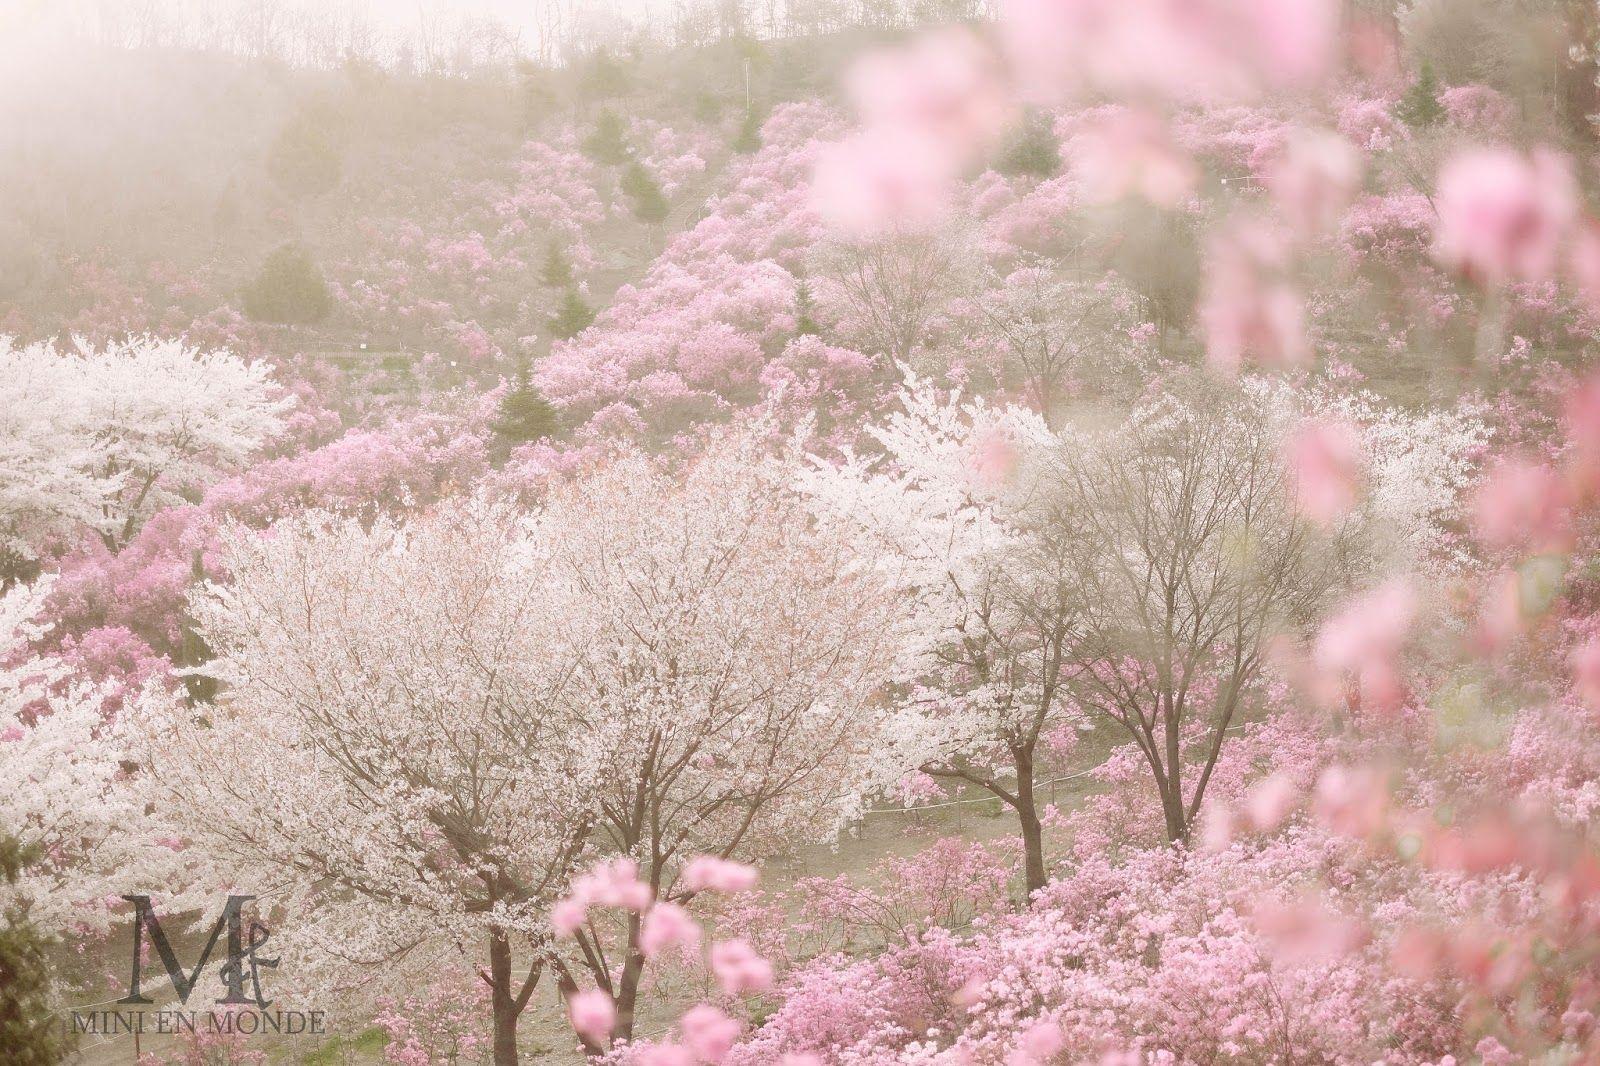 Bucheon Wonmisan Azalea Festival 원미산 진달래 축제 Azalea Festival South Korea Travel Spring Flowers